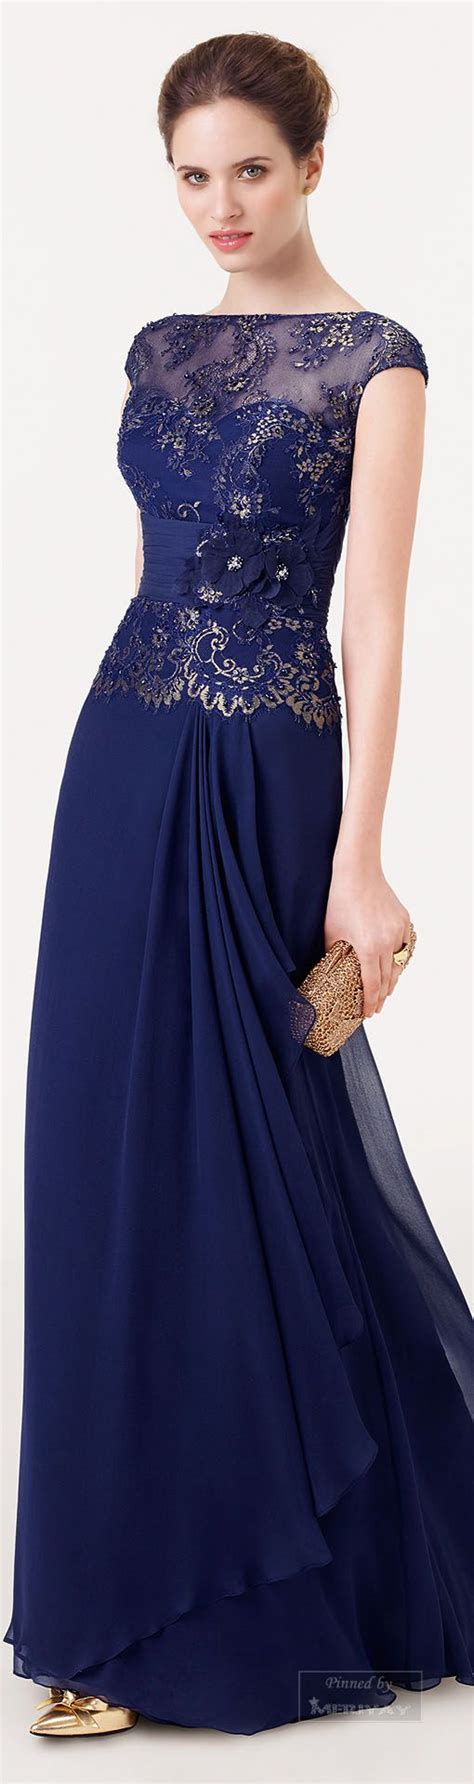 desain dress untuk prom night contoh dress untuk remaja model baju muslim modis untuk